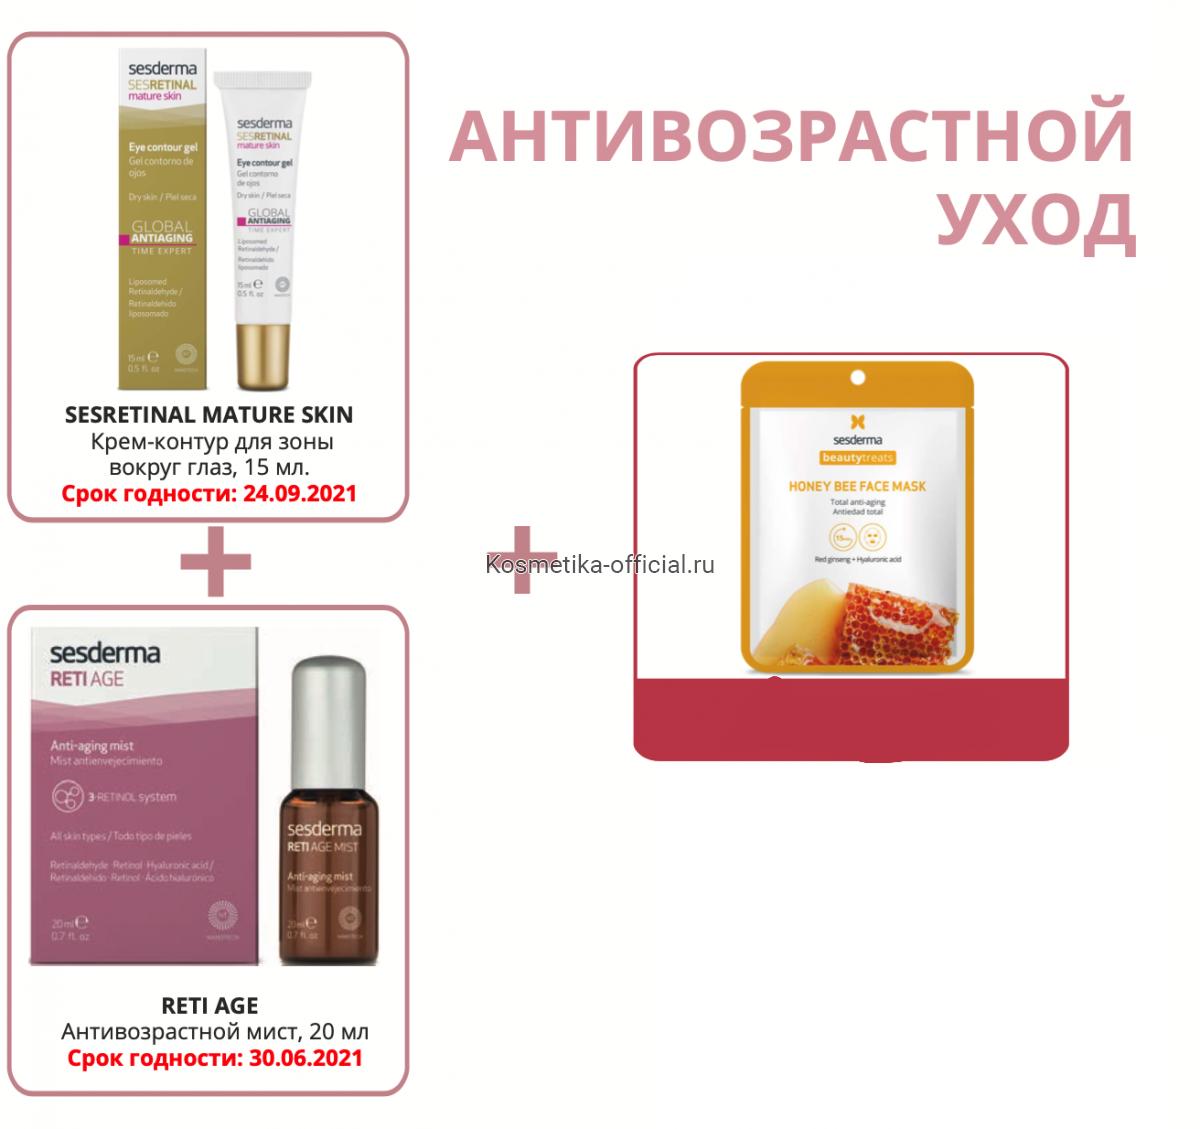 Акция: Sesretinal mature skin - Крем для зоны глаз 15 мл + Reti-Age Mist Антивозрастной мист, 20 мл + BEAUTY TREATS Маска антивозрастная для лица